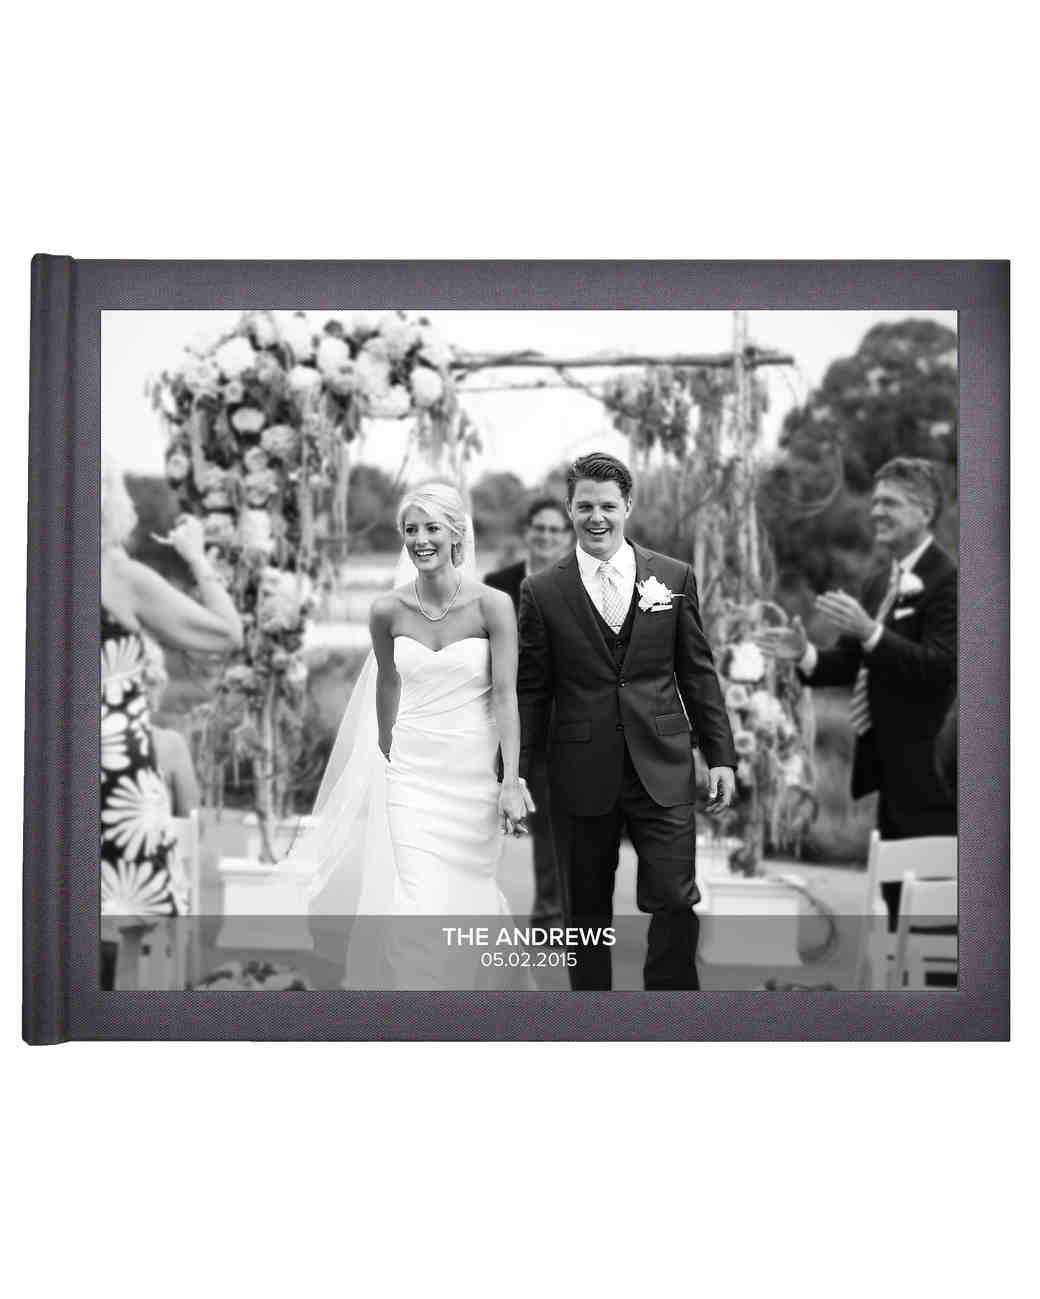 The Best Wedding Photo Albums for Every Budget | Martha Stewart ...